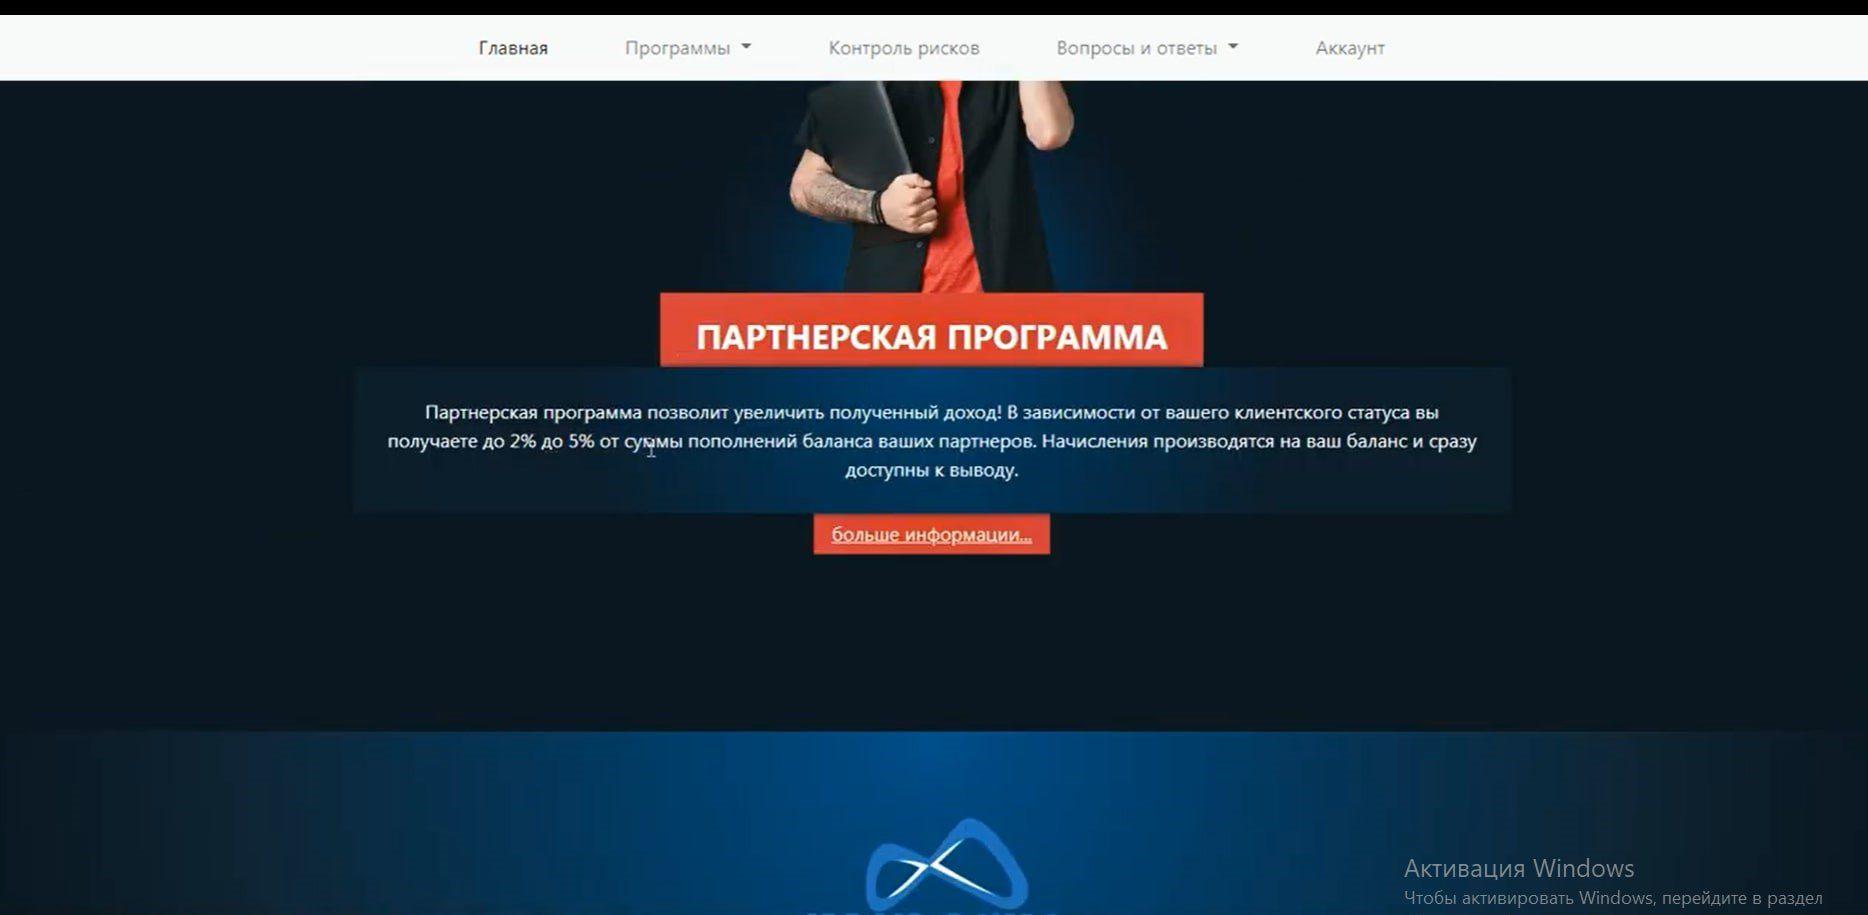 Minerix bot - партнерская программа